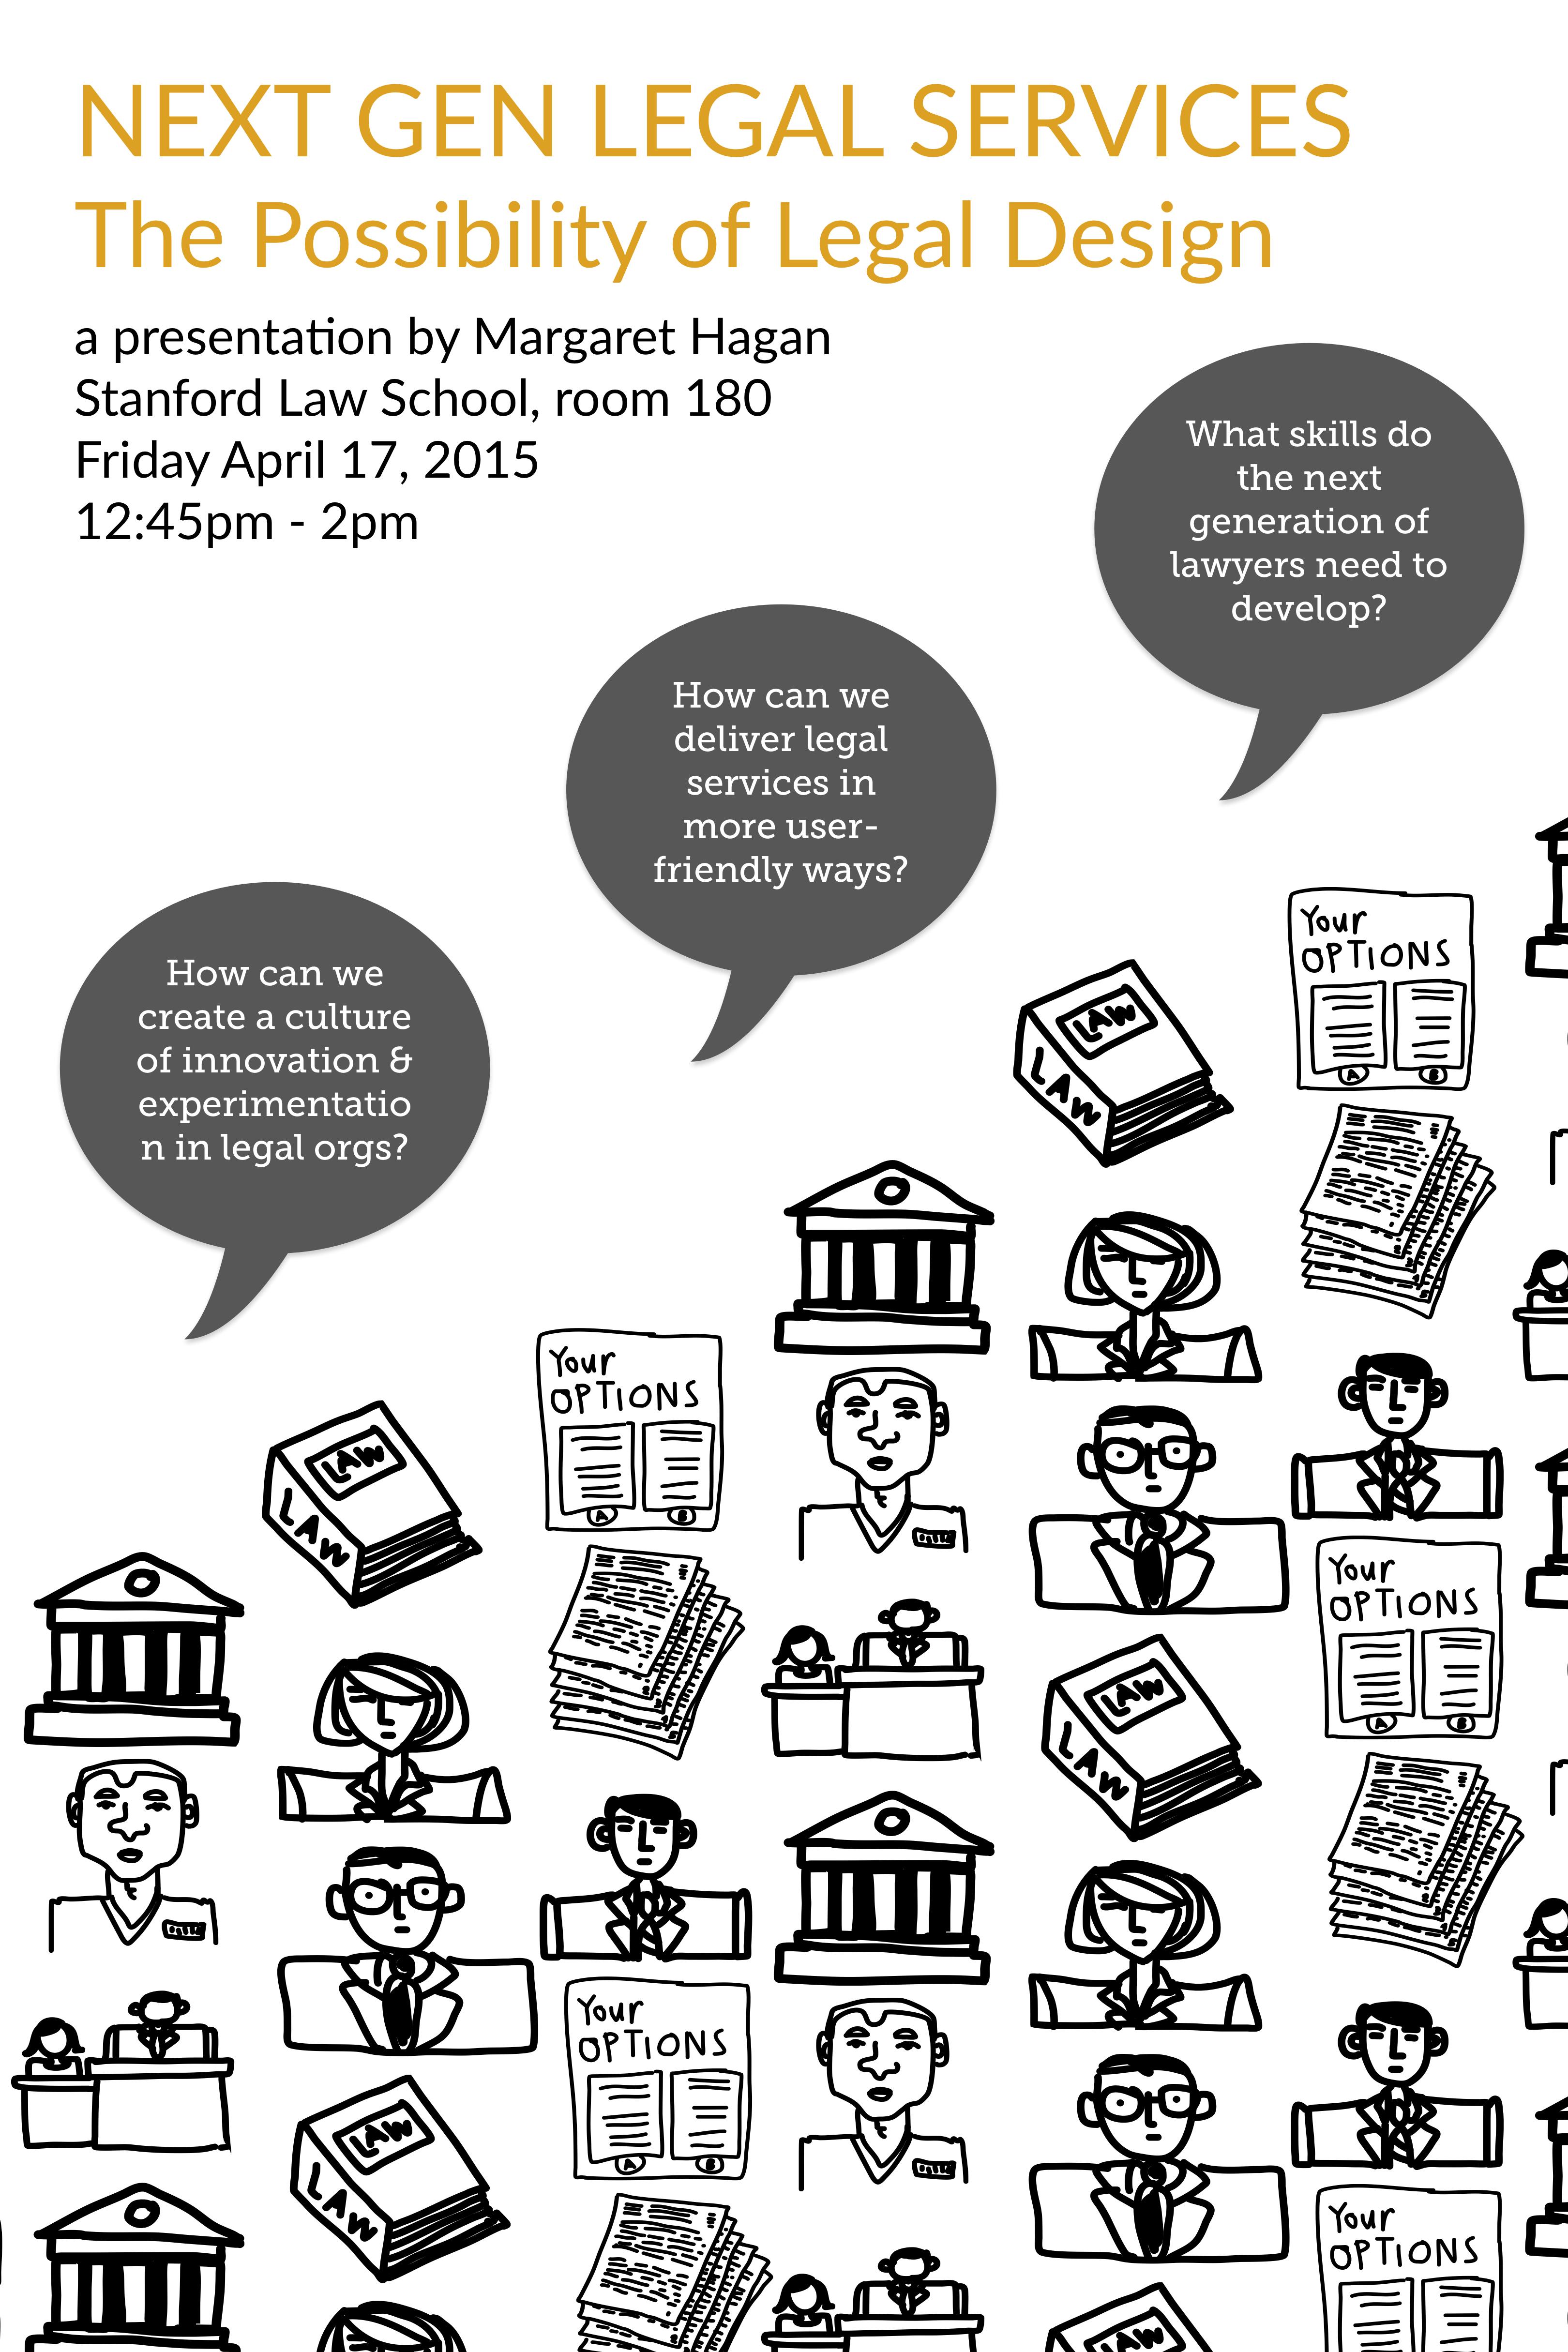 Next Gen Legal Services poster - a talk by Margaret Hagan